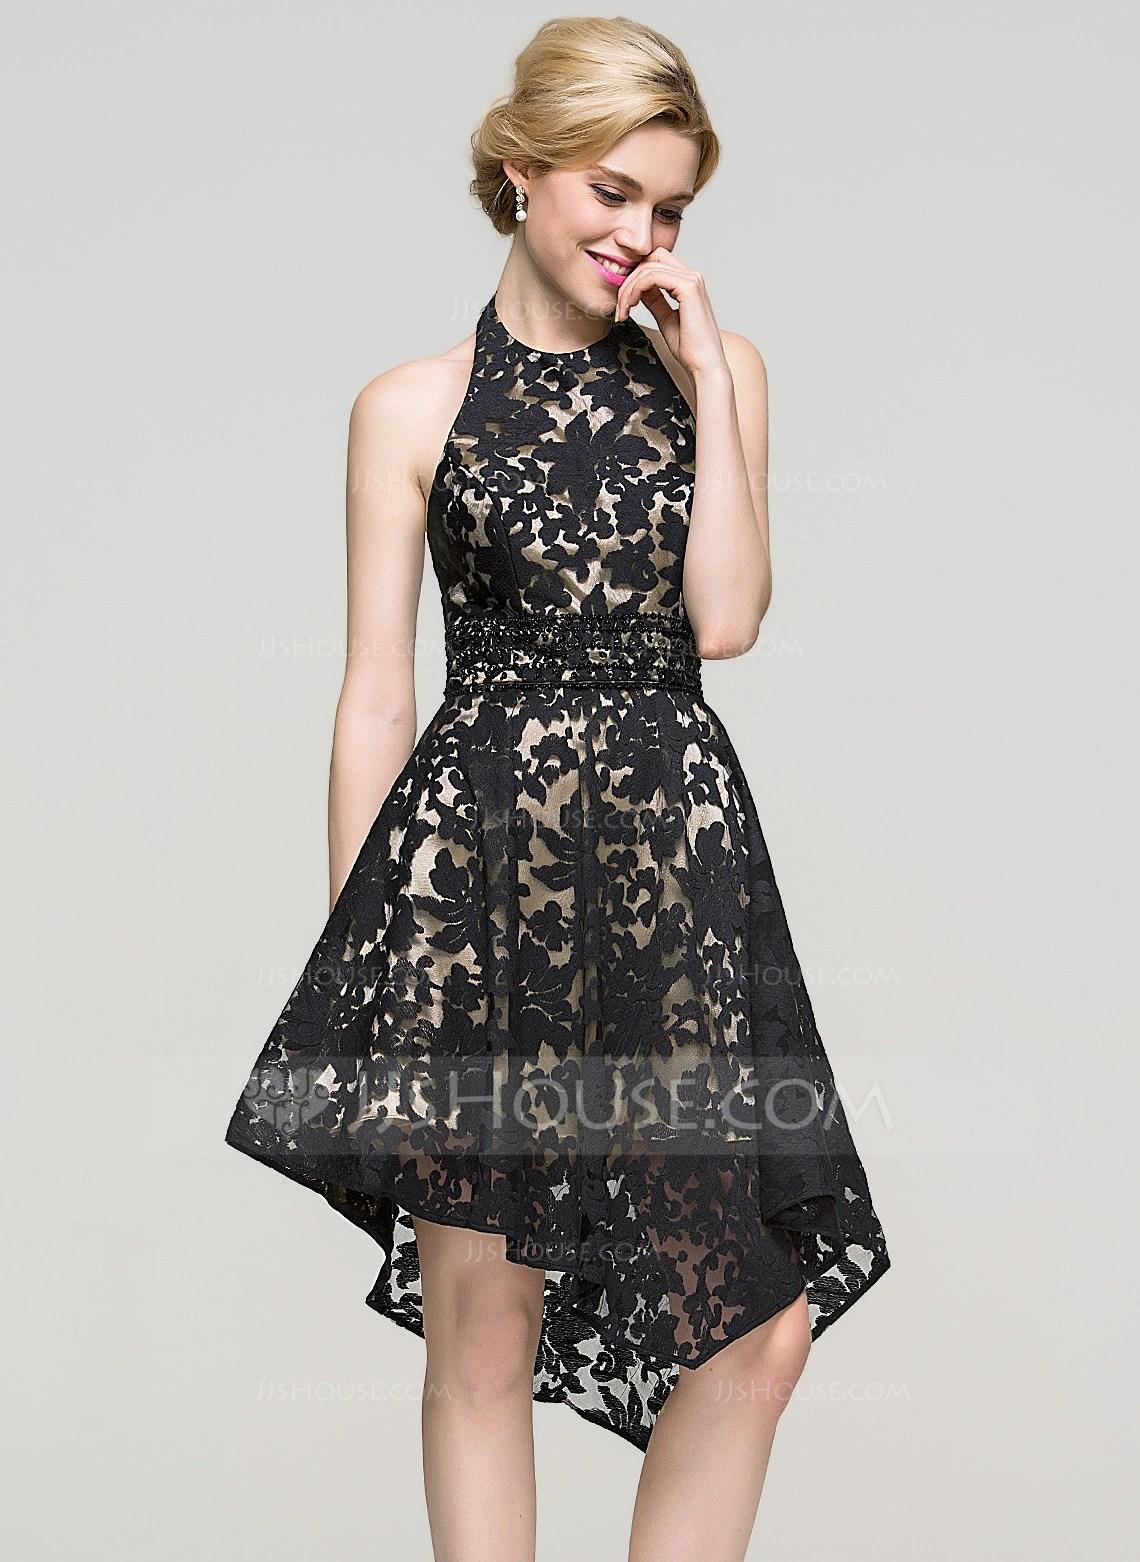 A LinePrincess Halter Asymmetrical Lace Cocktail Dress